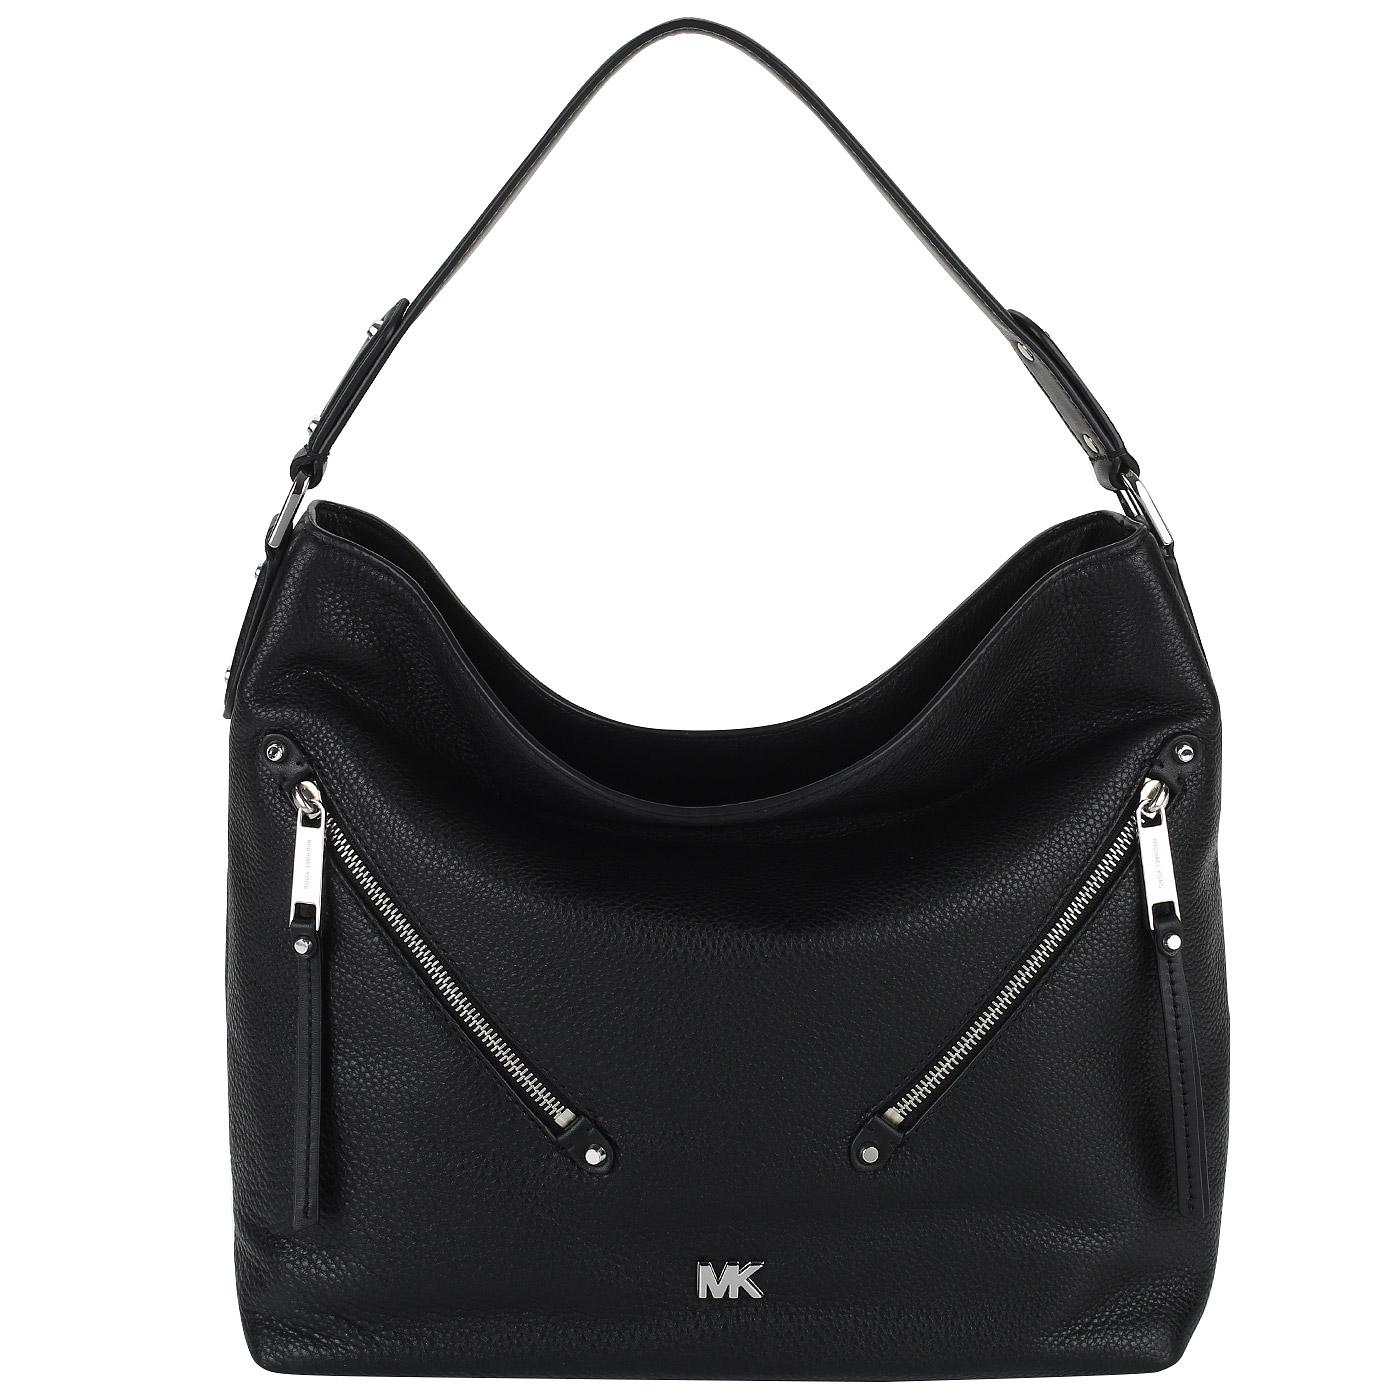 256a14d5535c Черная кожаная сумка Michael Kors Evie Черная кожаная сумка Michael Kors  Evie ...